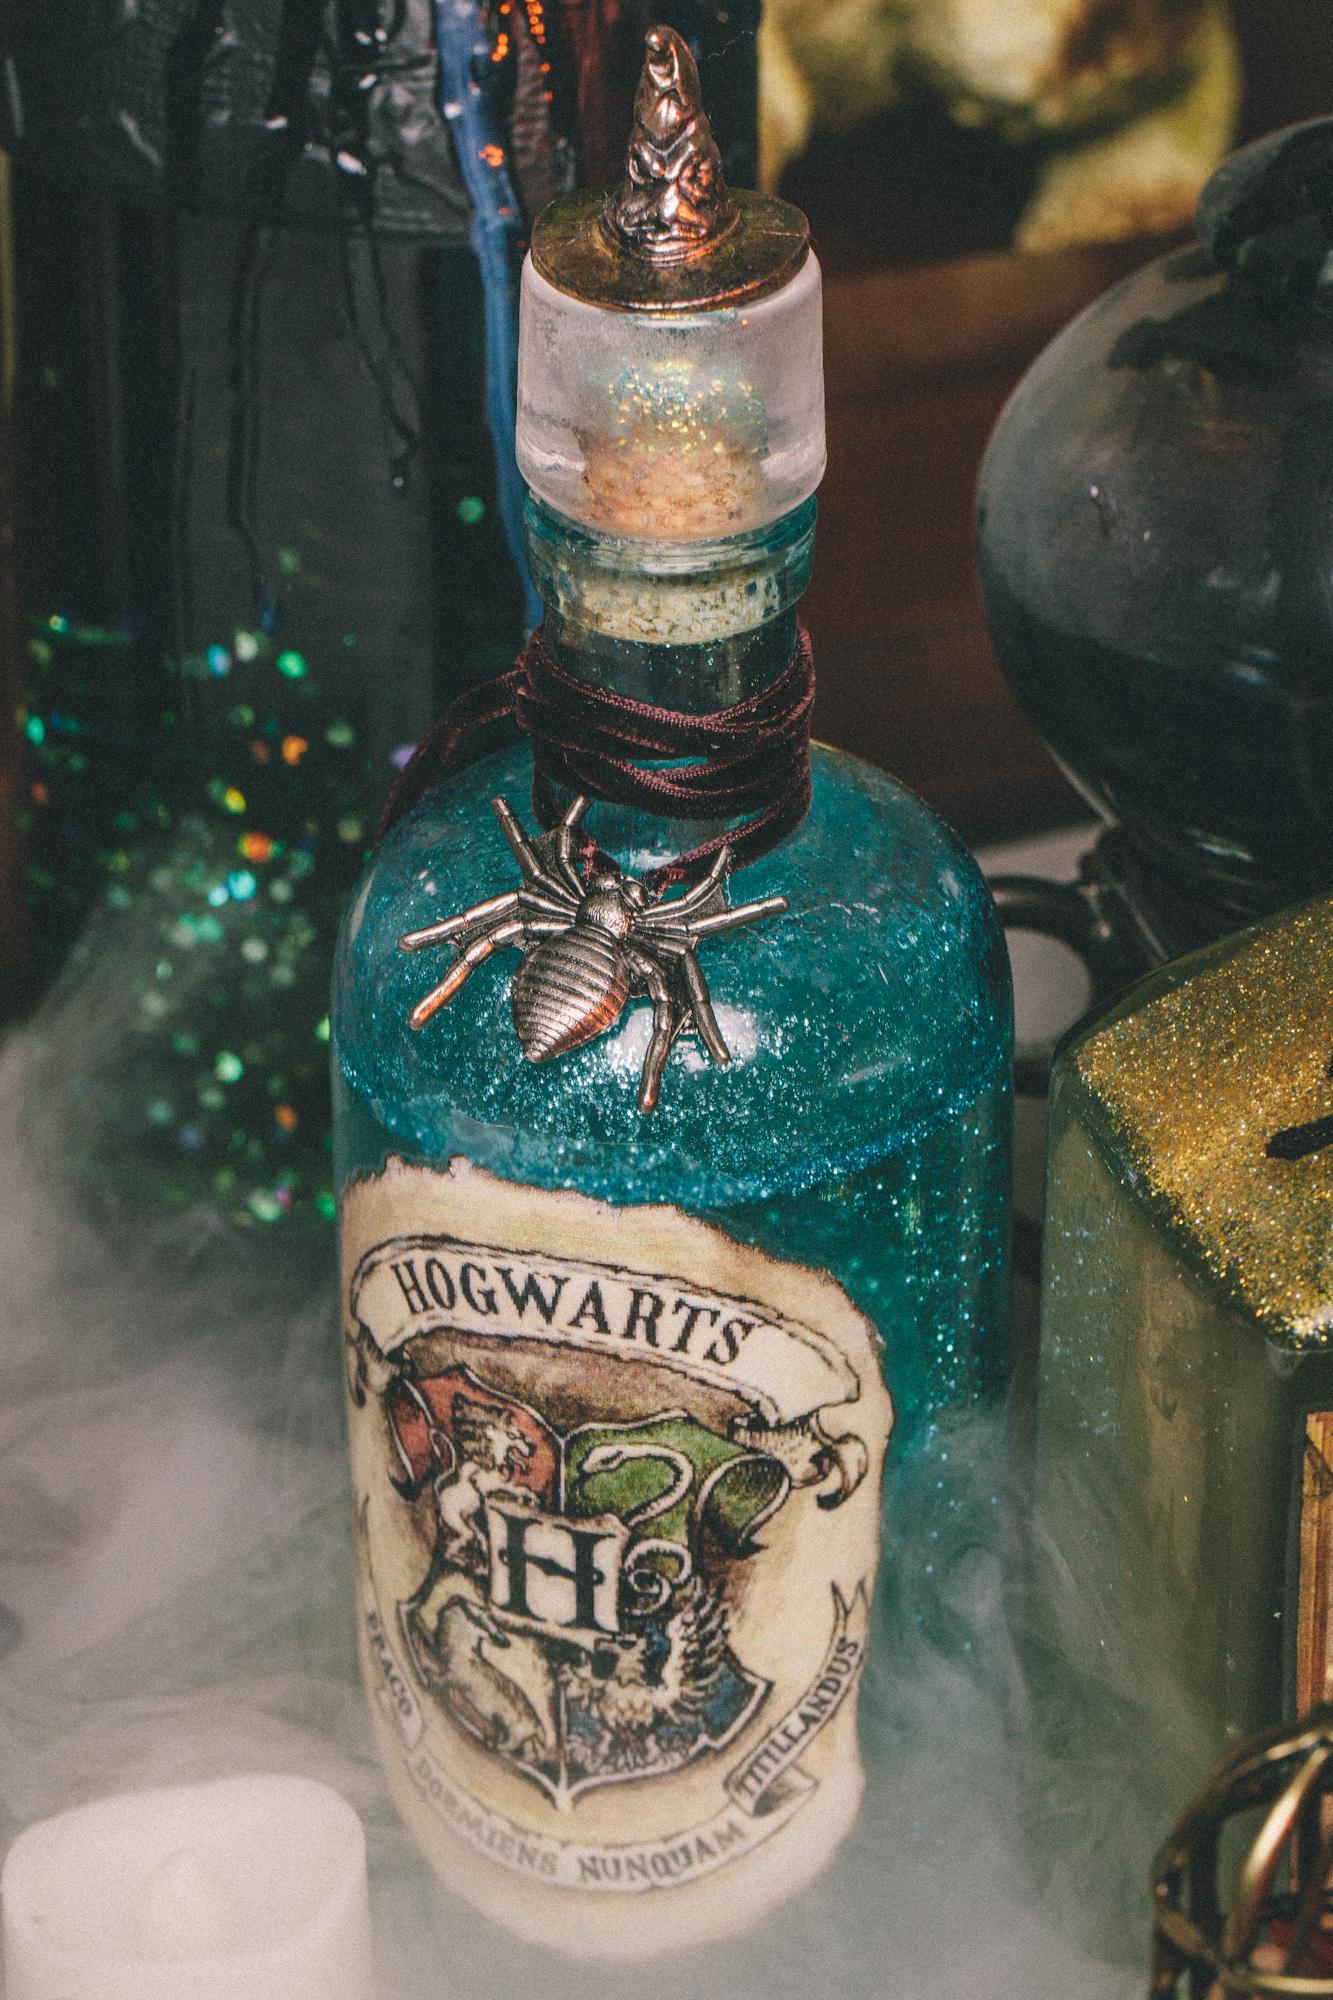 Diy Harry Potter Potions For Halloween Hogwarts Potion